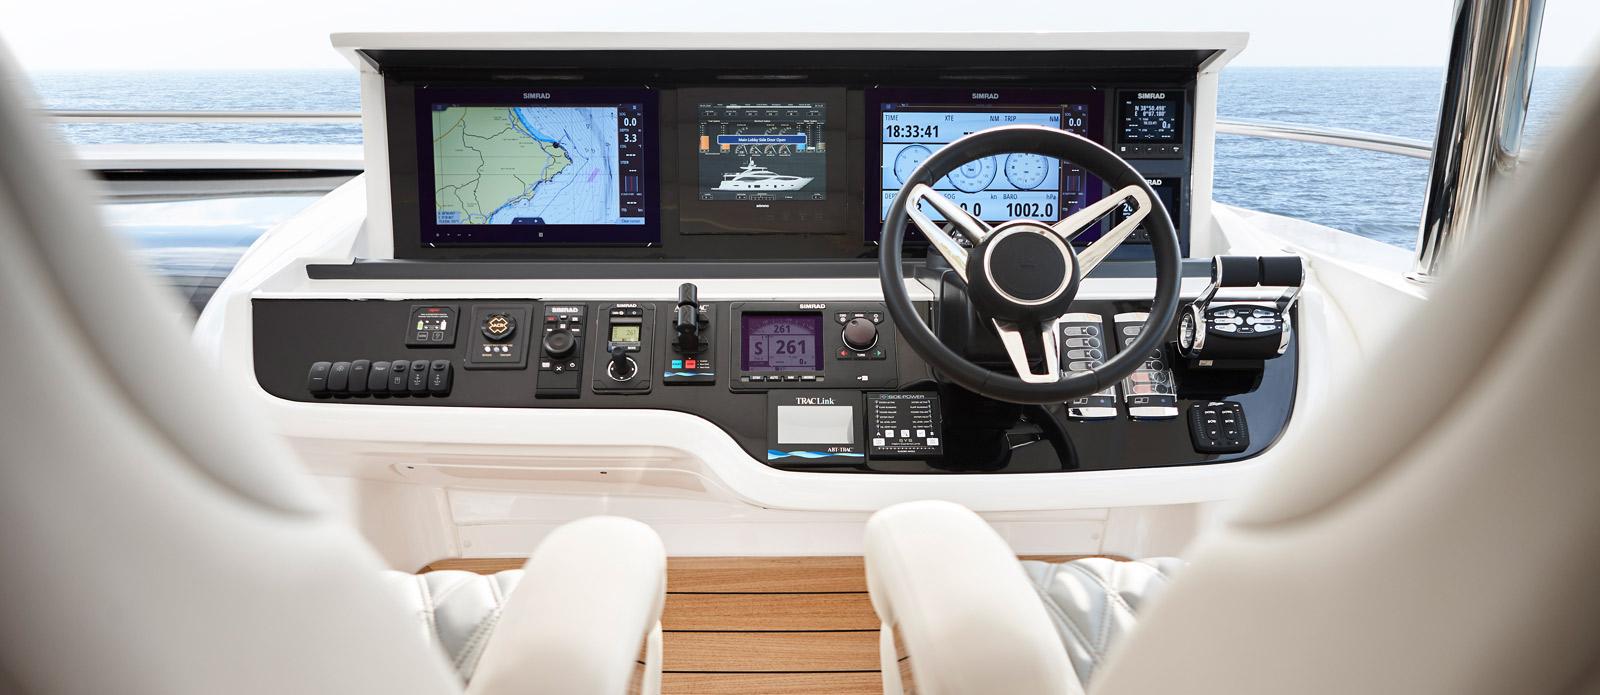 Princess 30 Metre Yacht Bandazul - Flybridge Helm Console